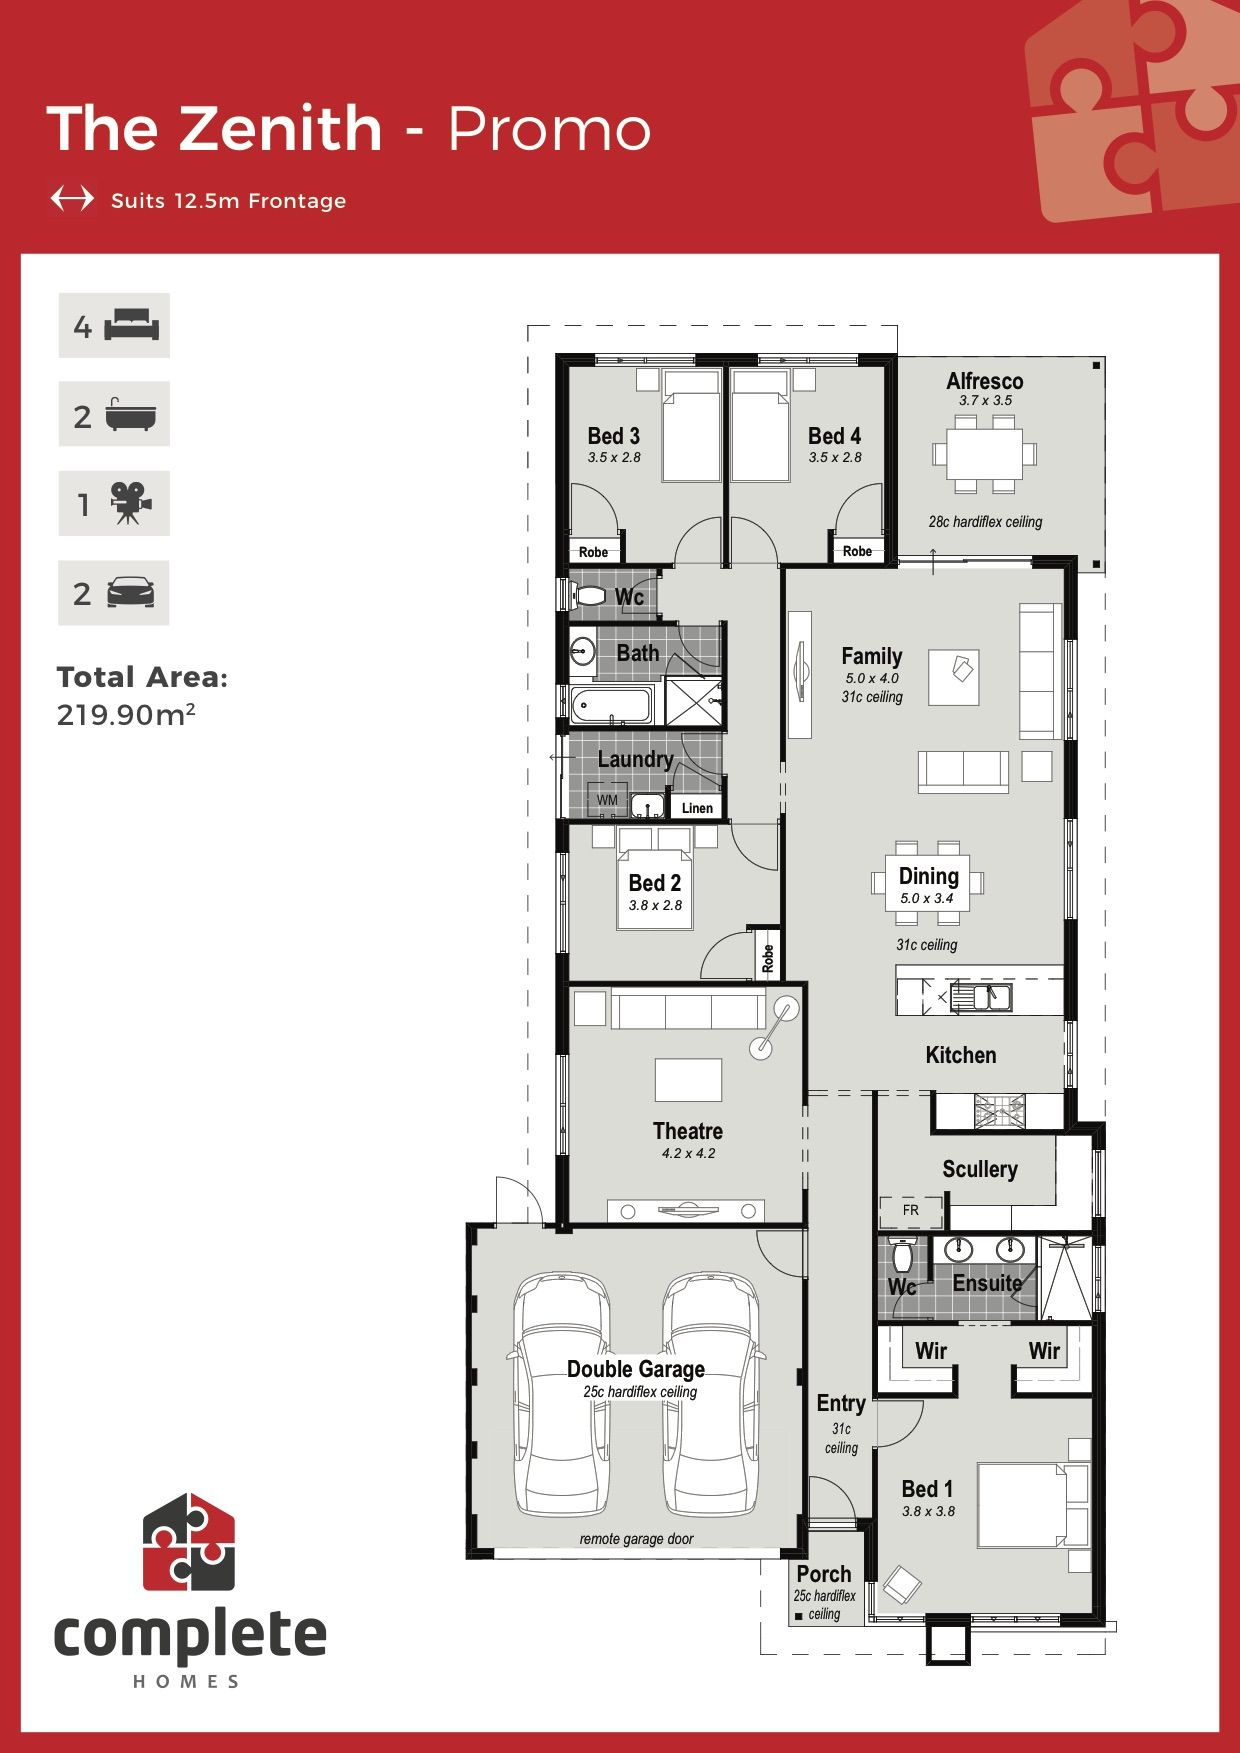 Pin de ngel galv n en arquitectura pinterest for Ejes arquitectonicos